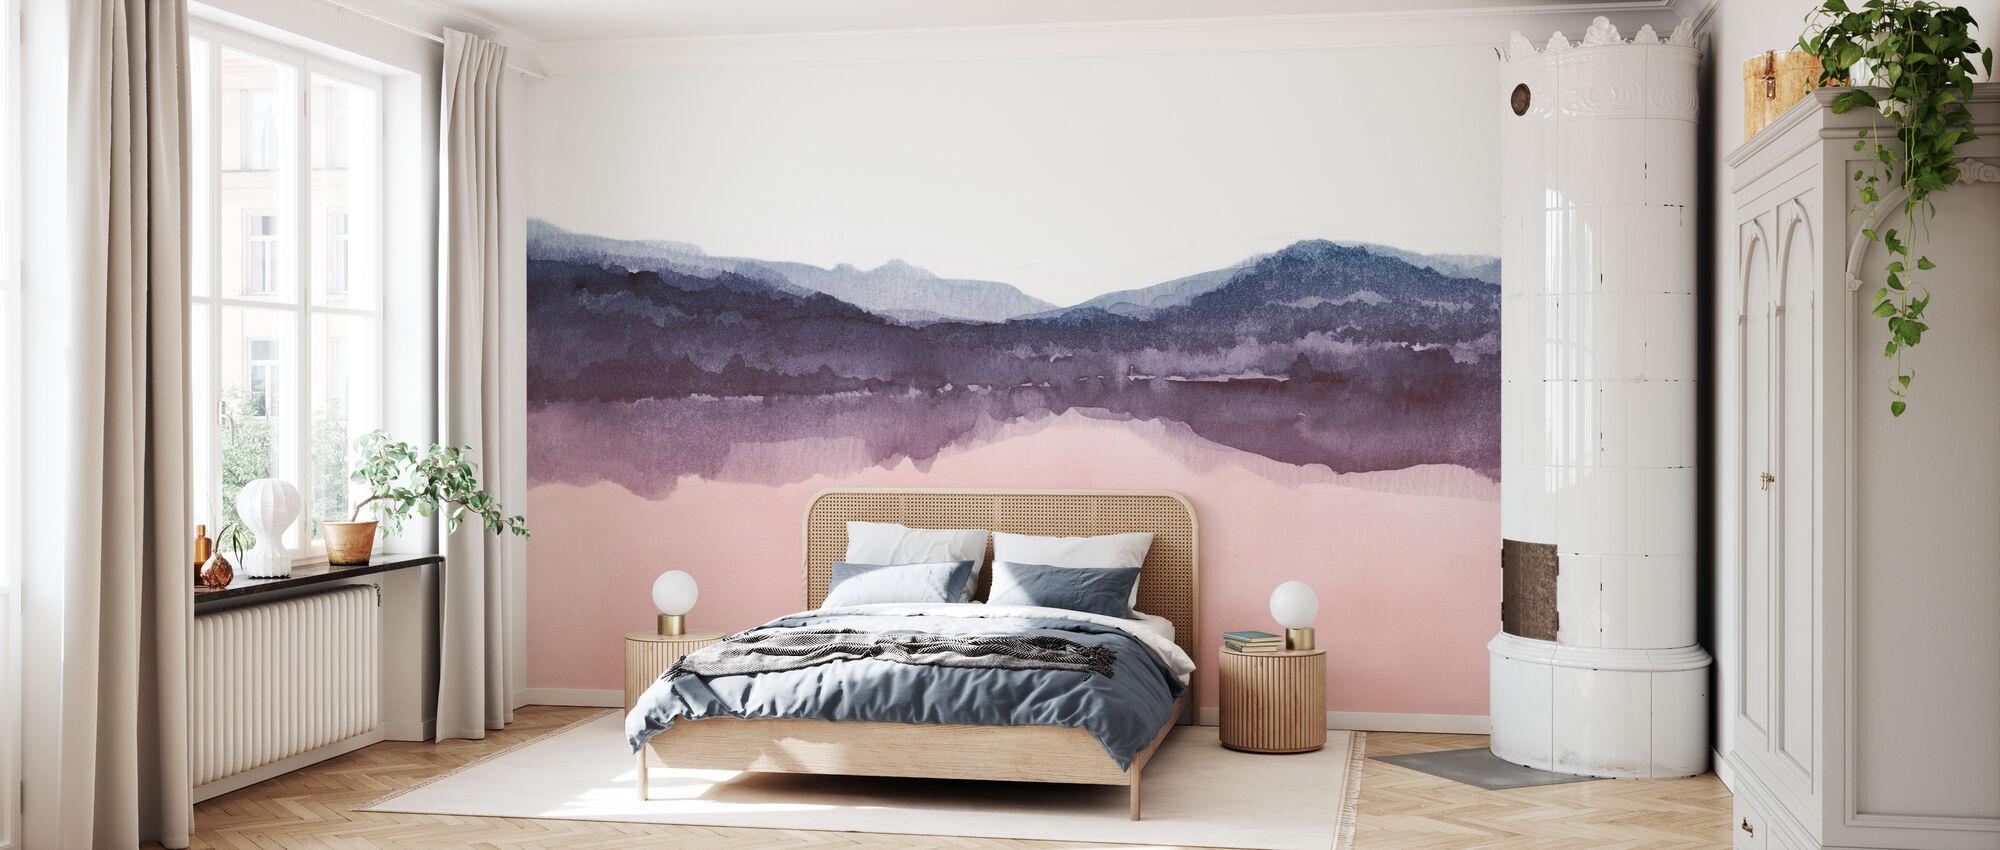 Watercolor Landscape Iv Pink And Blue Kostenlos Gelieferte Fototapete Von Hochster Qualitat Photowall